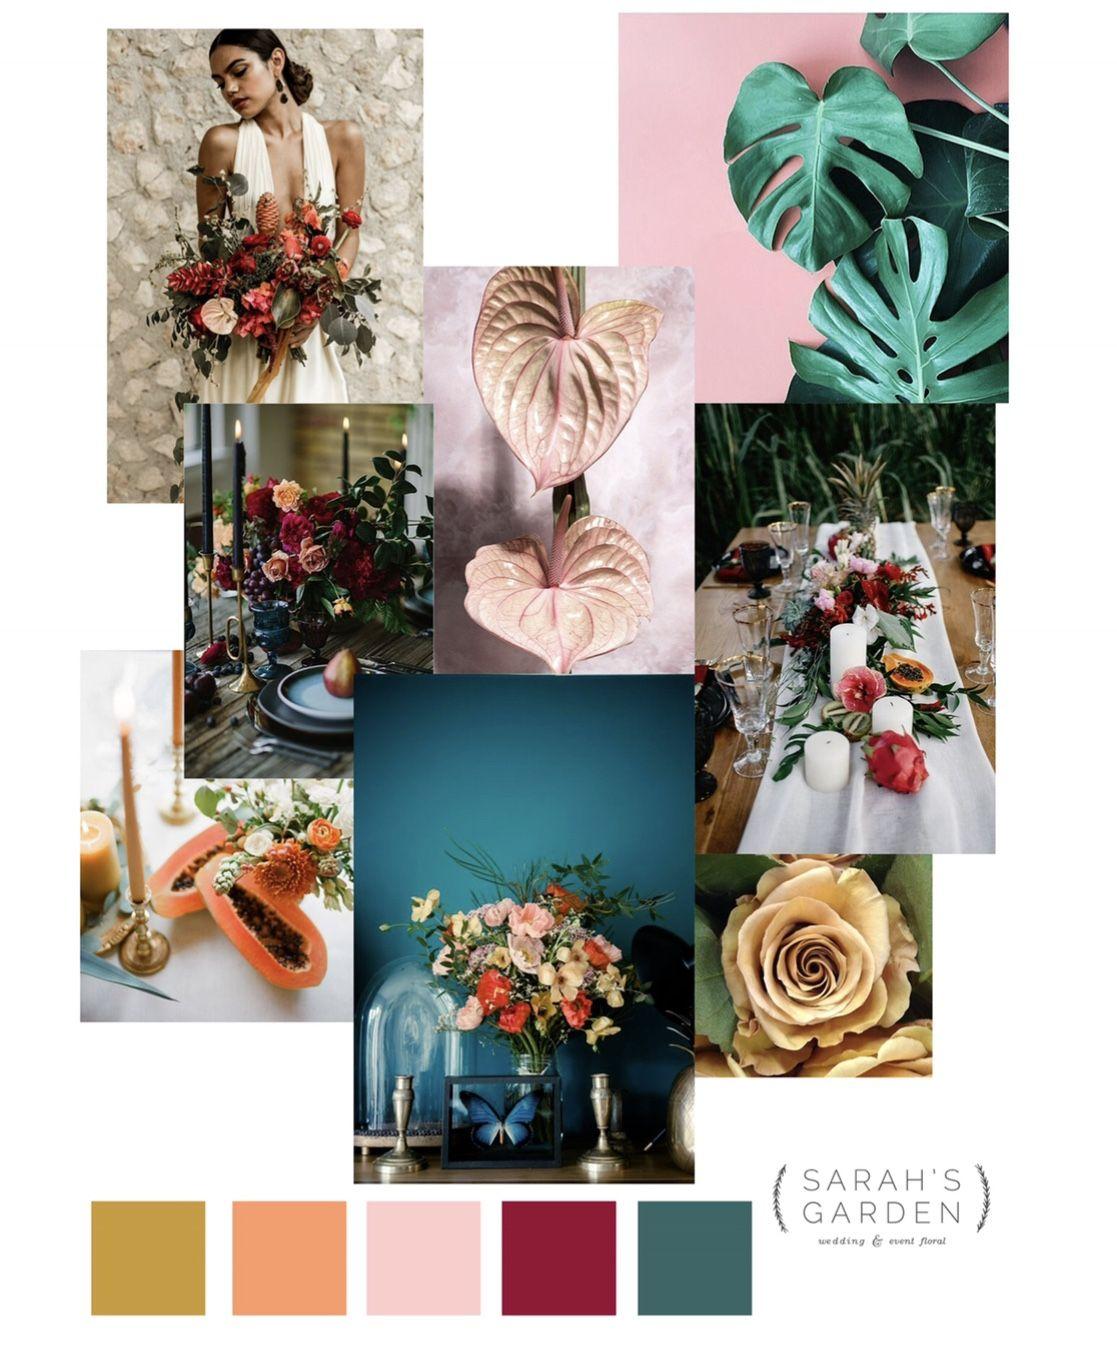 Modern Tropical Wedding Color Palette Inspiration Tropical Wedding Color Palette Wedding Color Palette Inspiration Wedding Color Palette